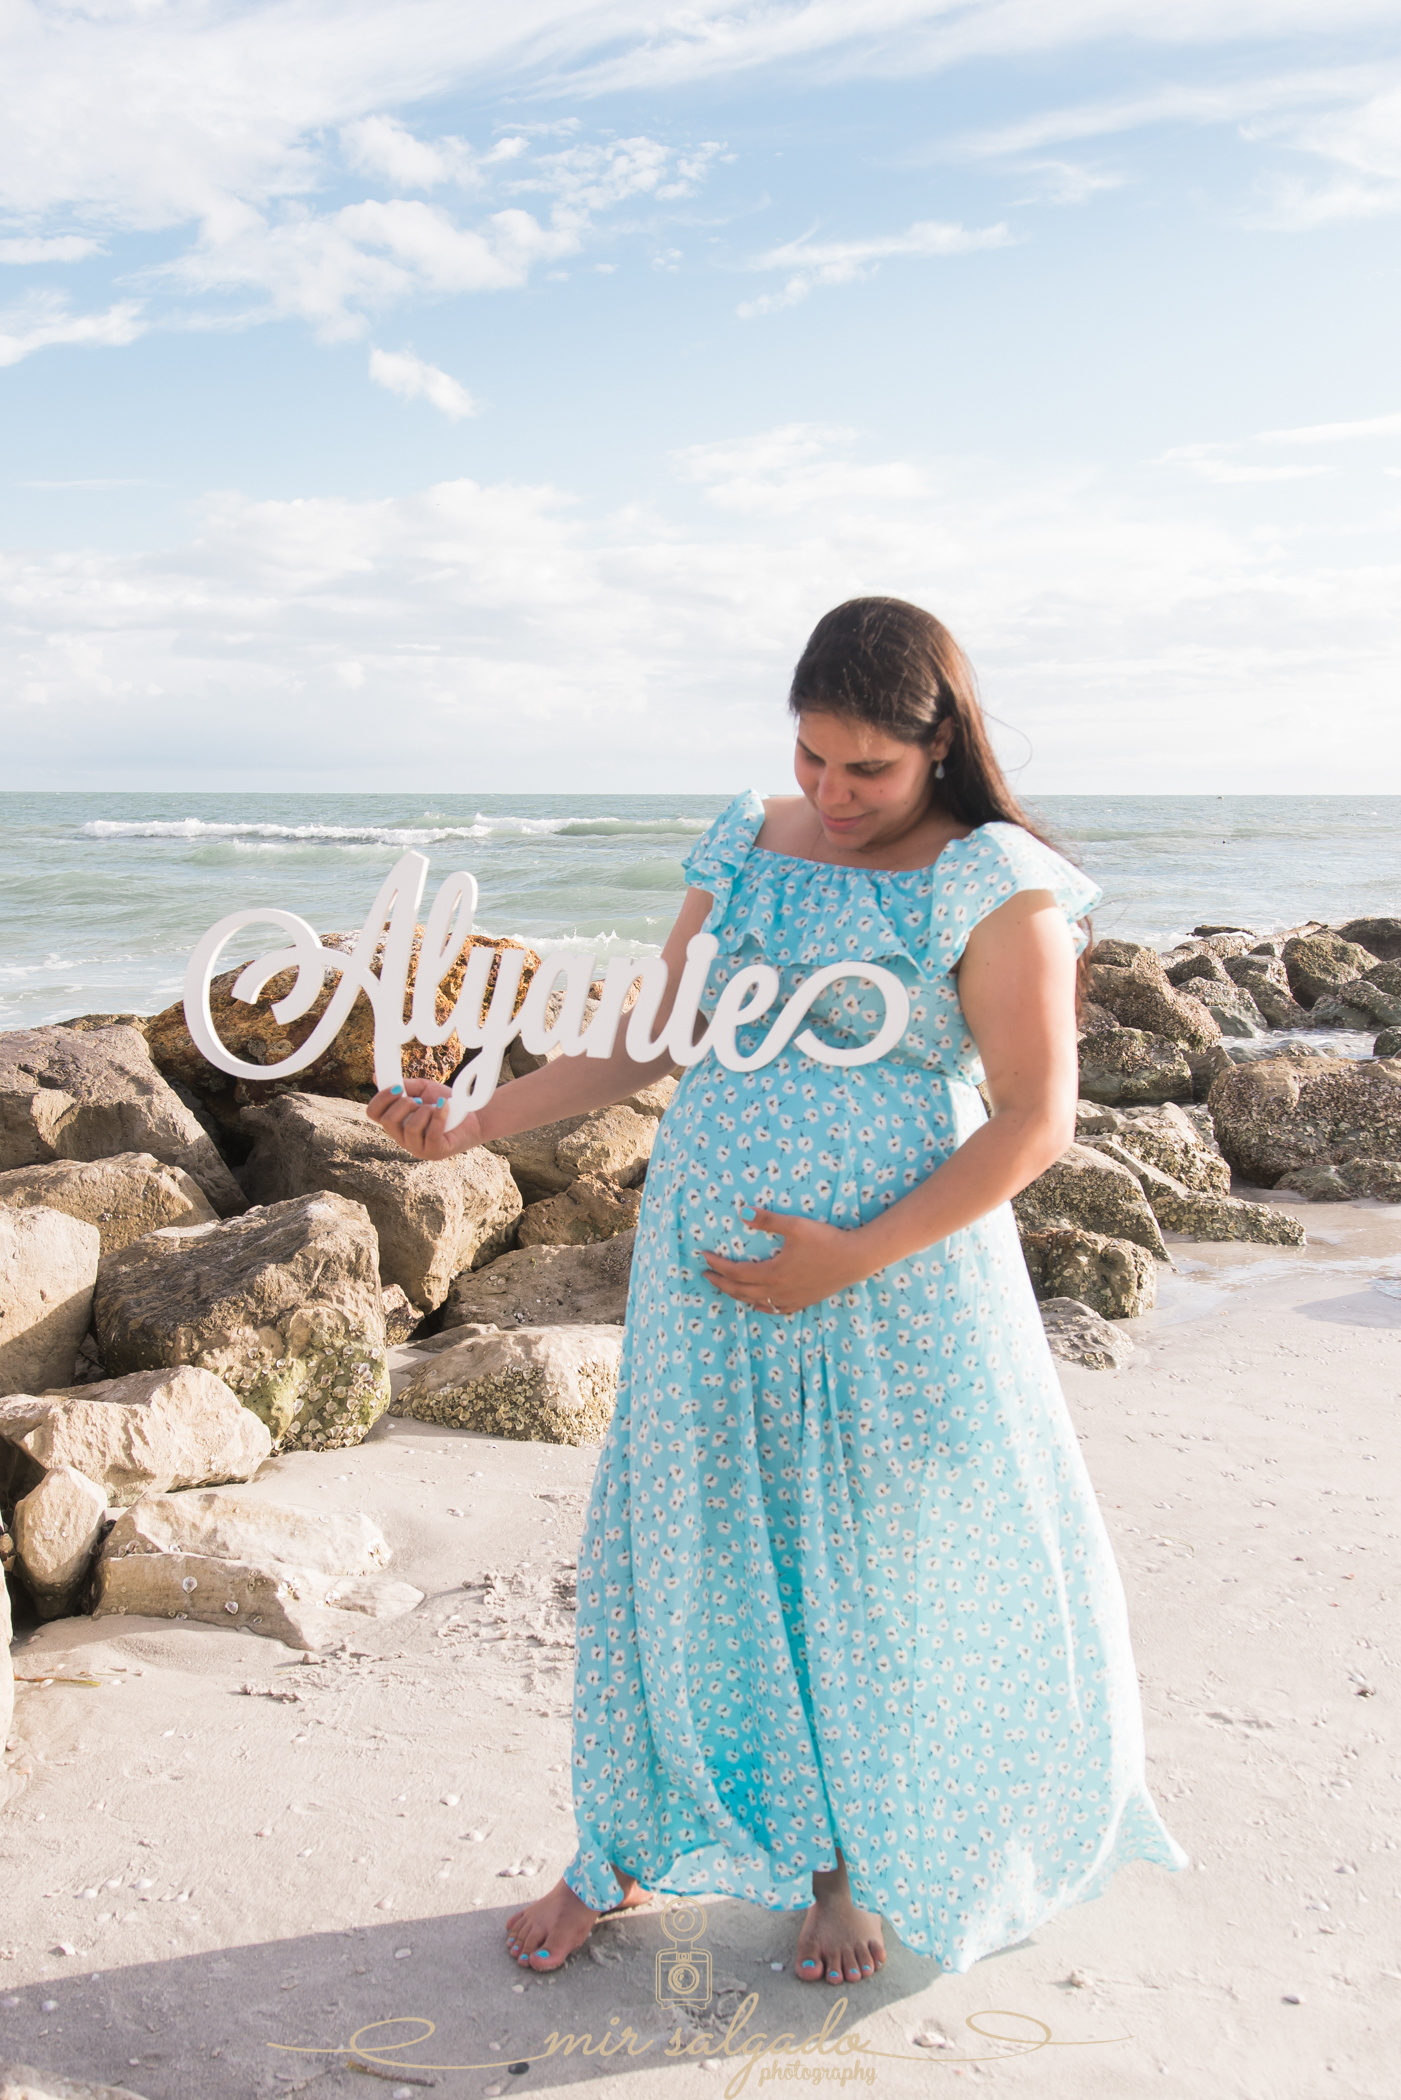 Maternity session-FL-florida-tampa-photographer-treasure-island-baby-ocean-shore-rocks-parents-parenting